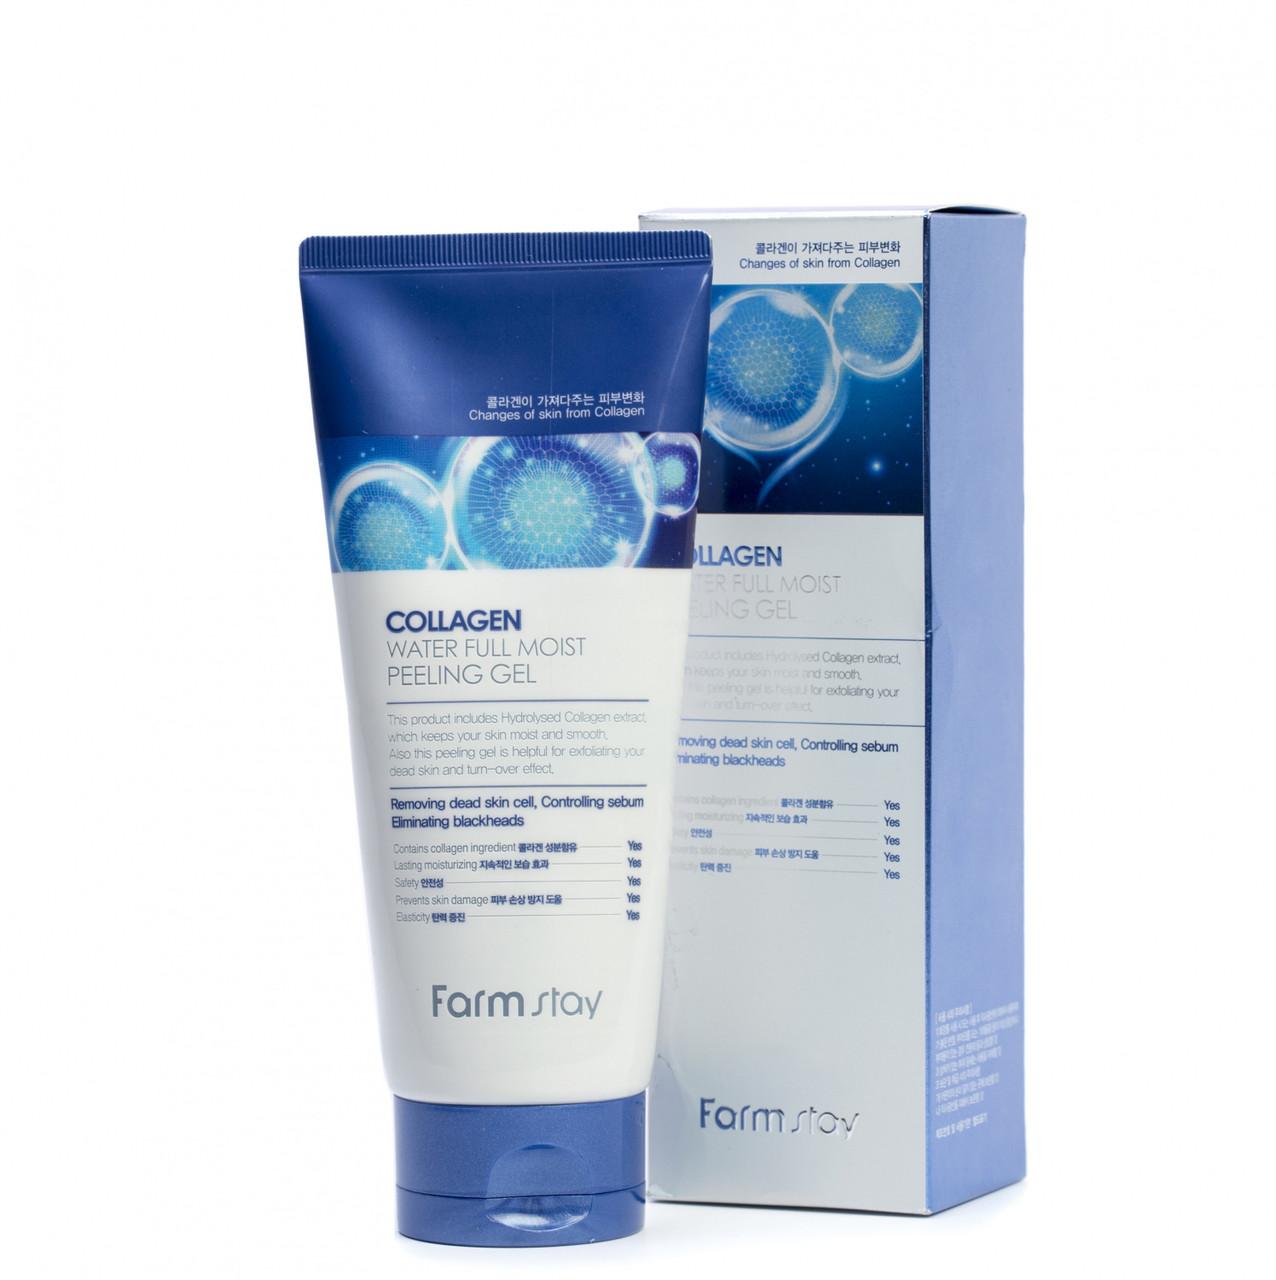 Пилинг гель для лица Farm Stay Collagen Water Full Moist Peeling Gel 180 ml.